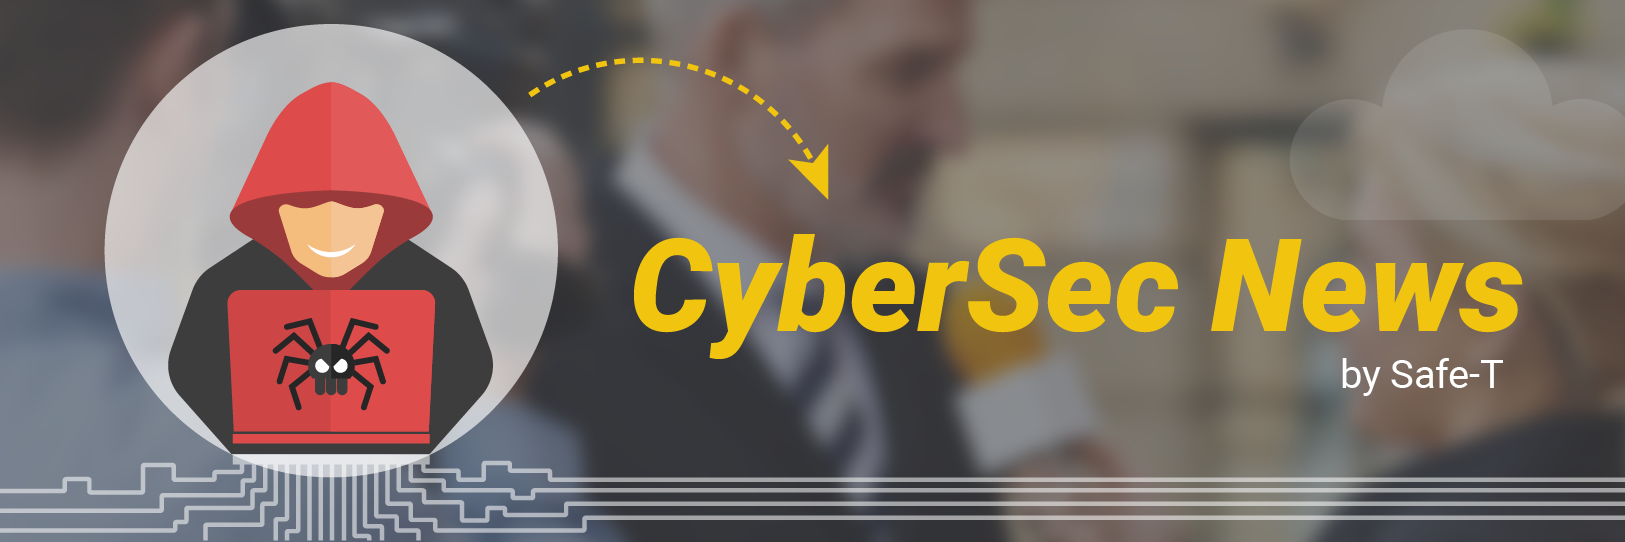 CyberSec News - August 2016